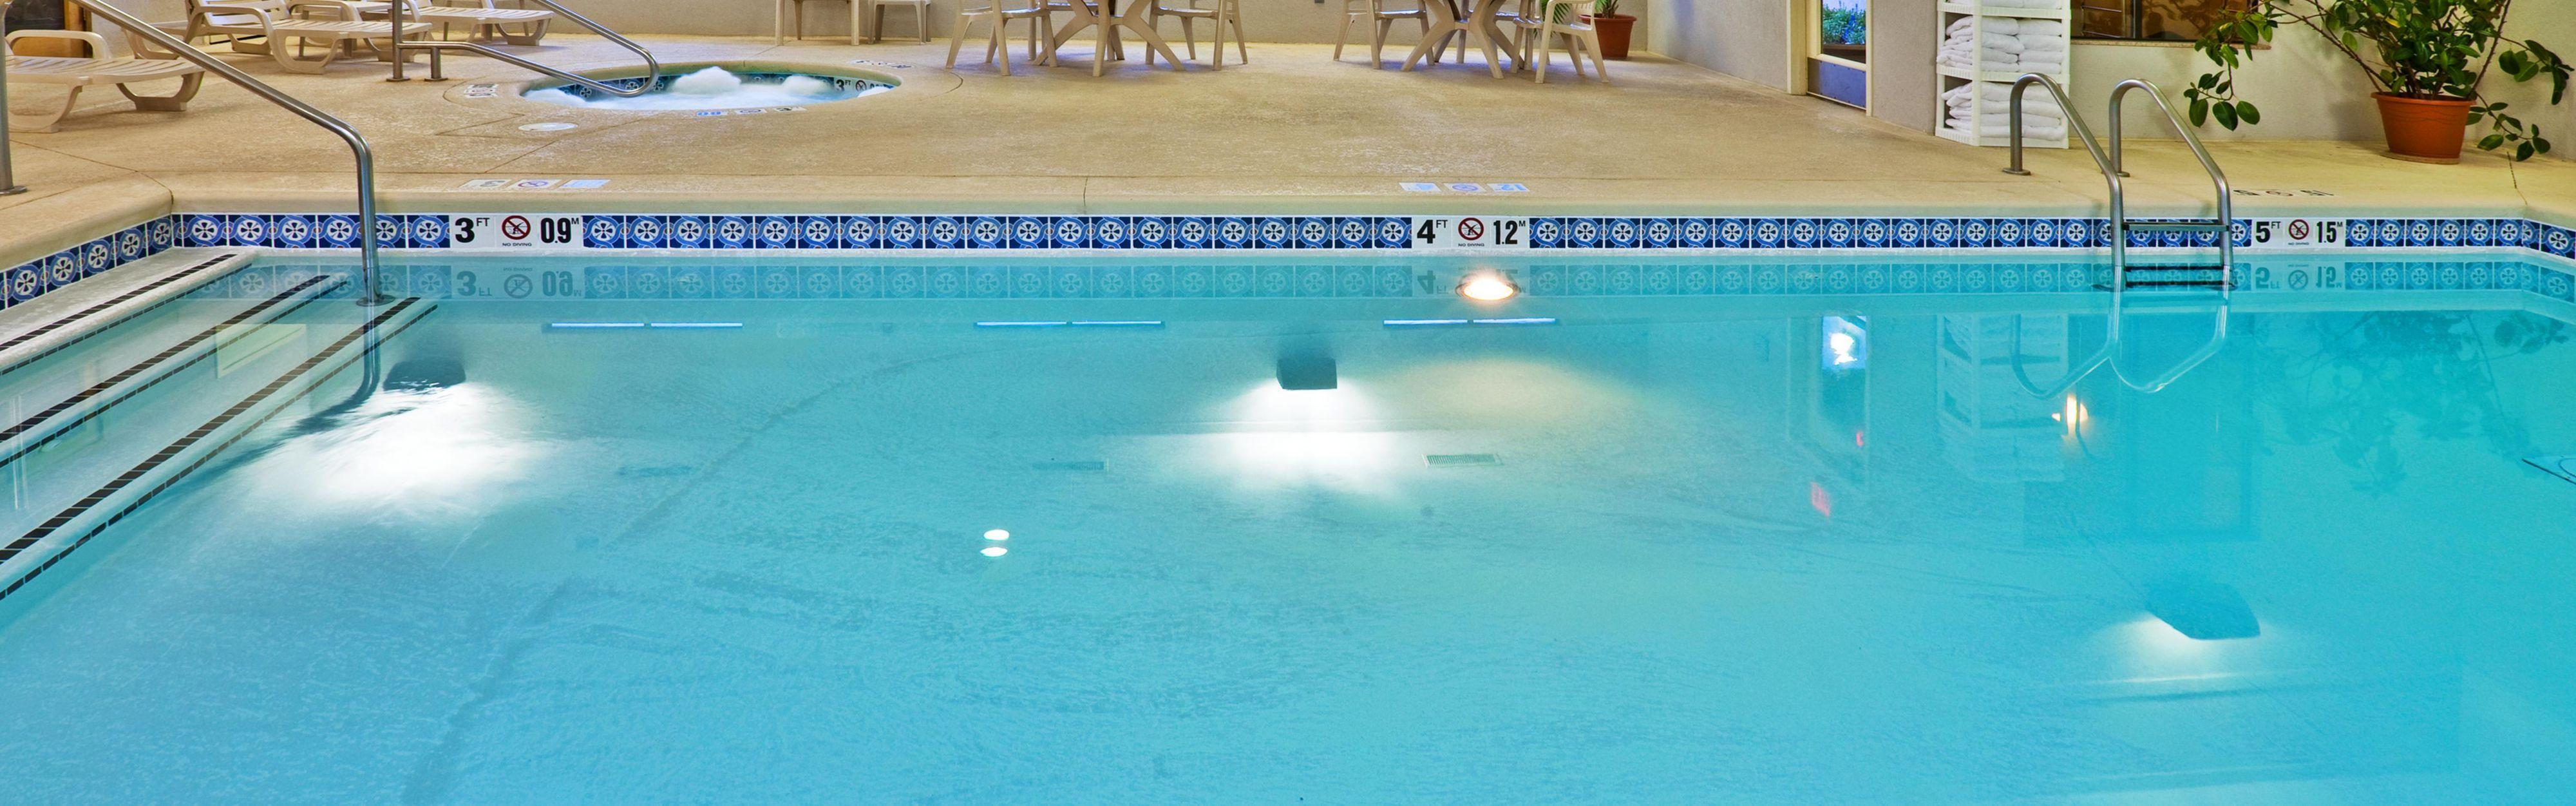 Holiday Inn Express Amp Suites Muskogee Muskogee Oklahoma